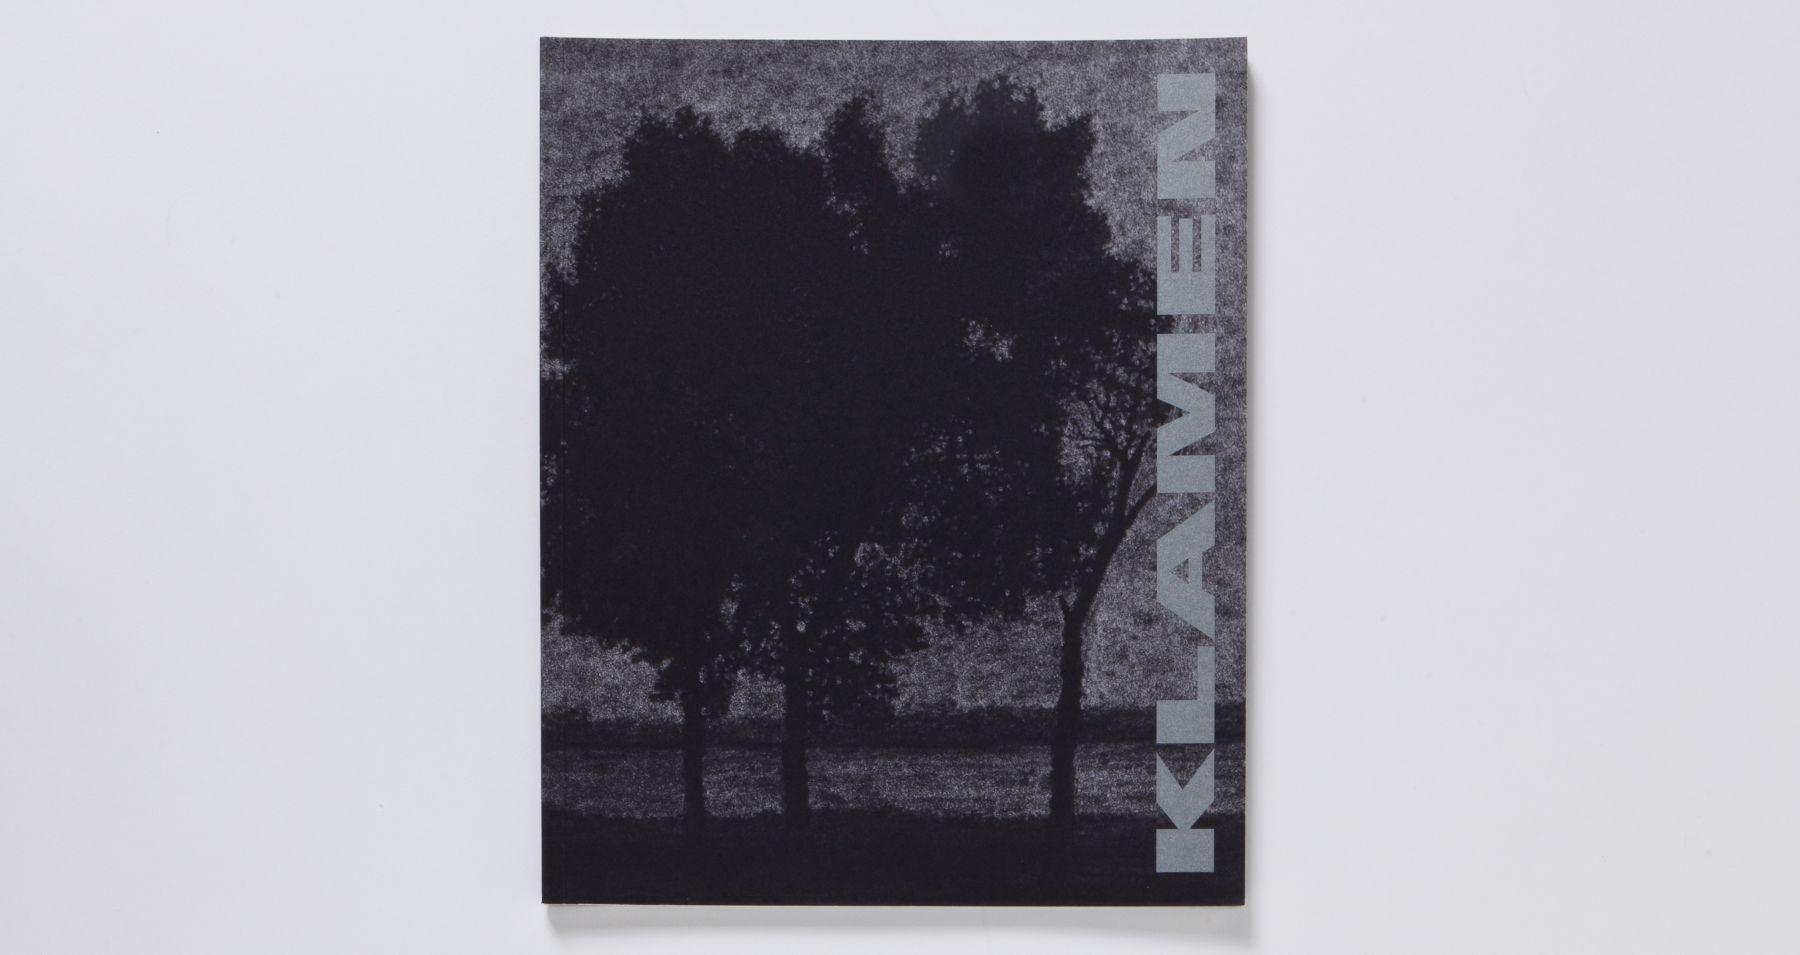 David Klamen compound views 2005 catalogue